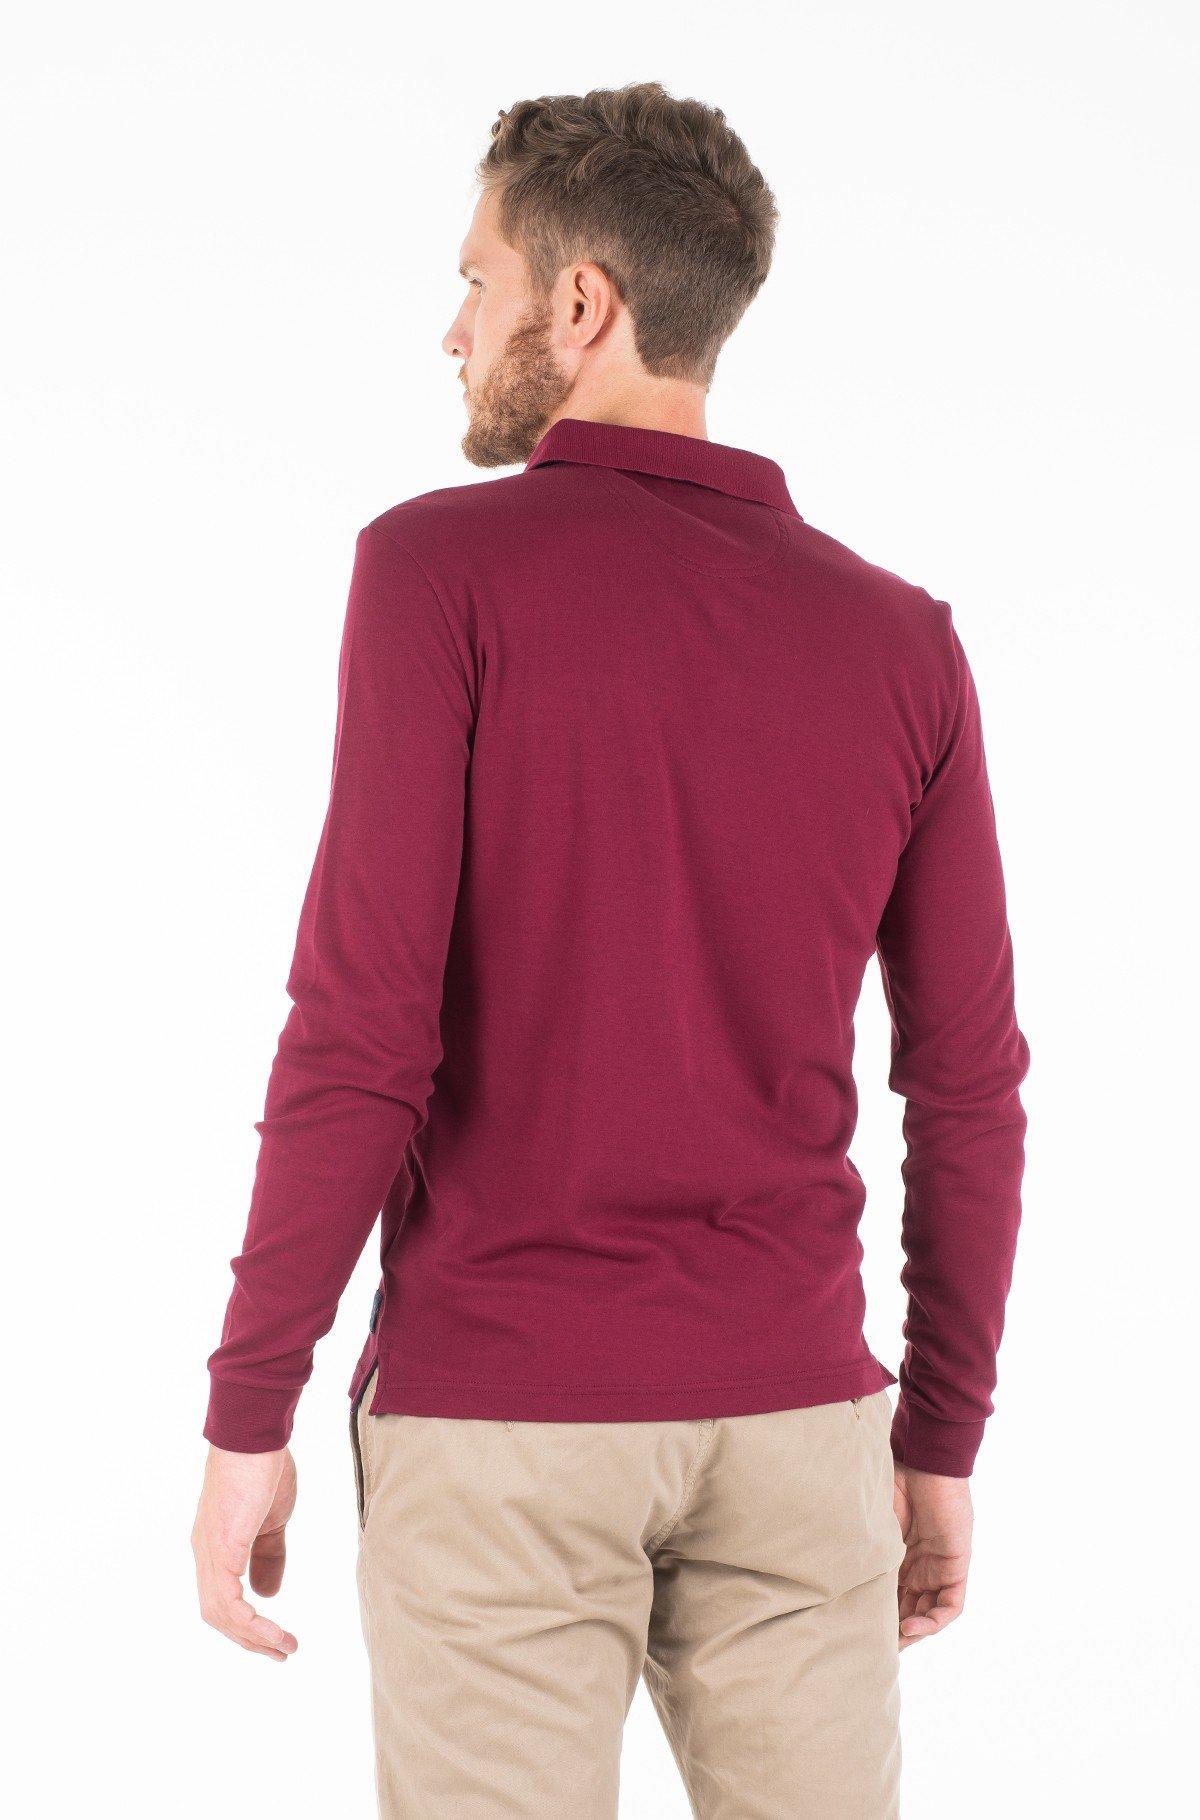 Polo marškinėliai ilgomis rankovėmis 53504-92302-full-2